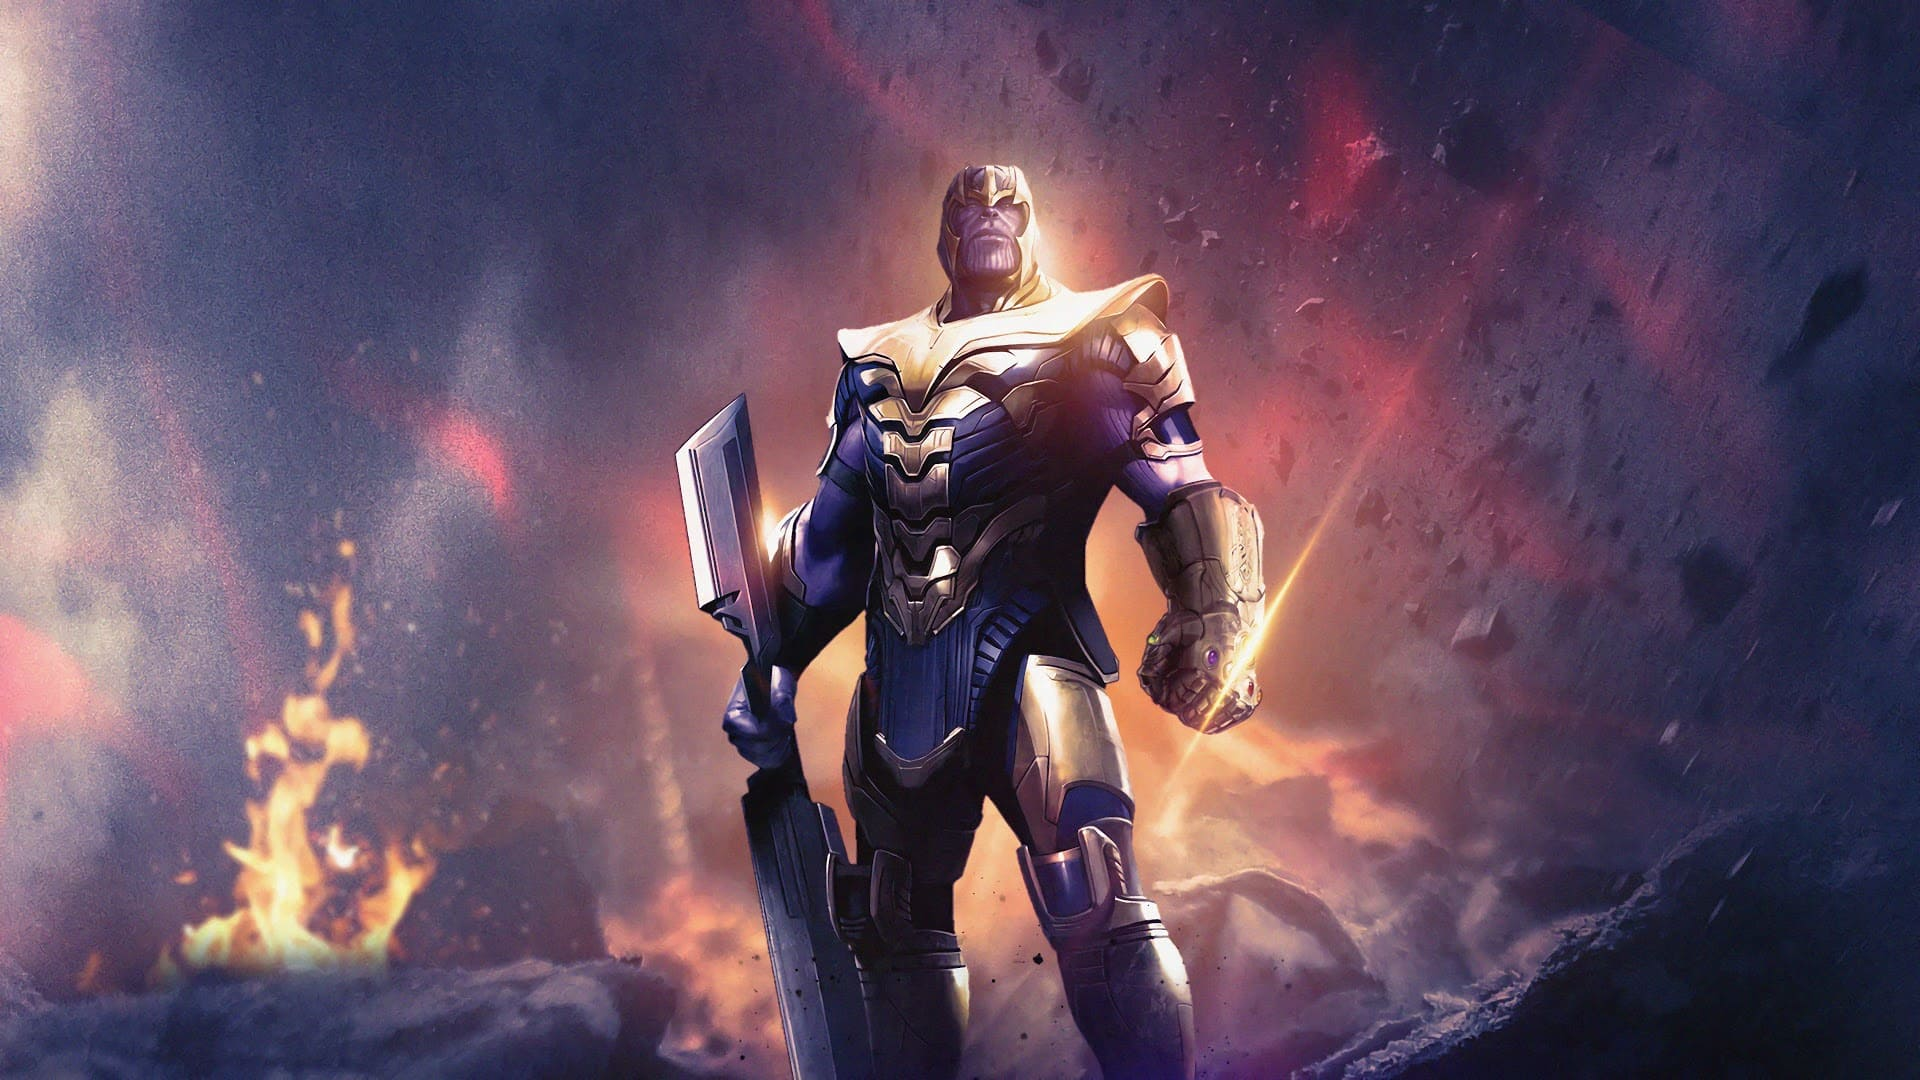 Top 85 Avengers Endgame Wallpapers 4k Hd